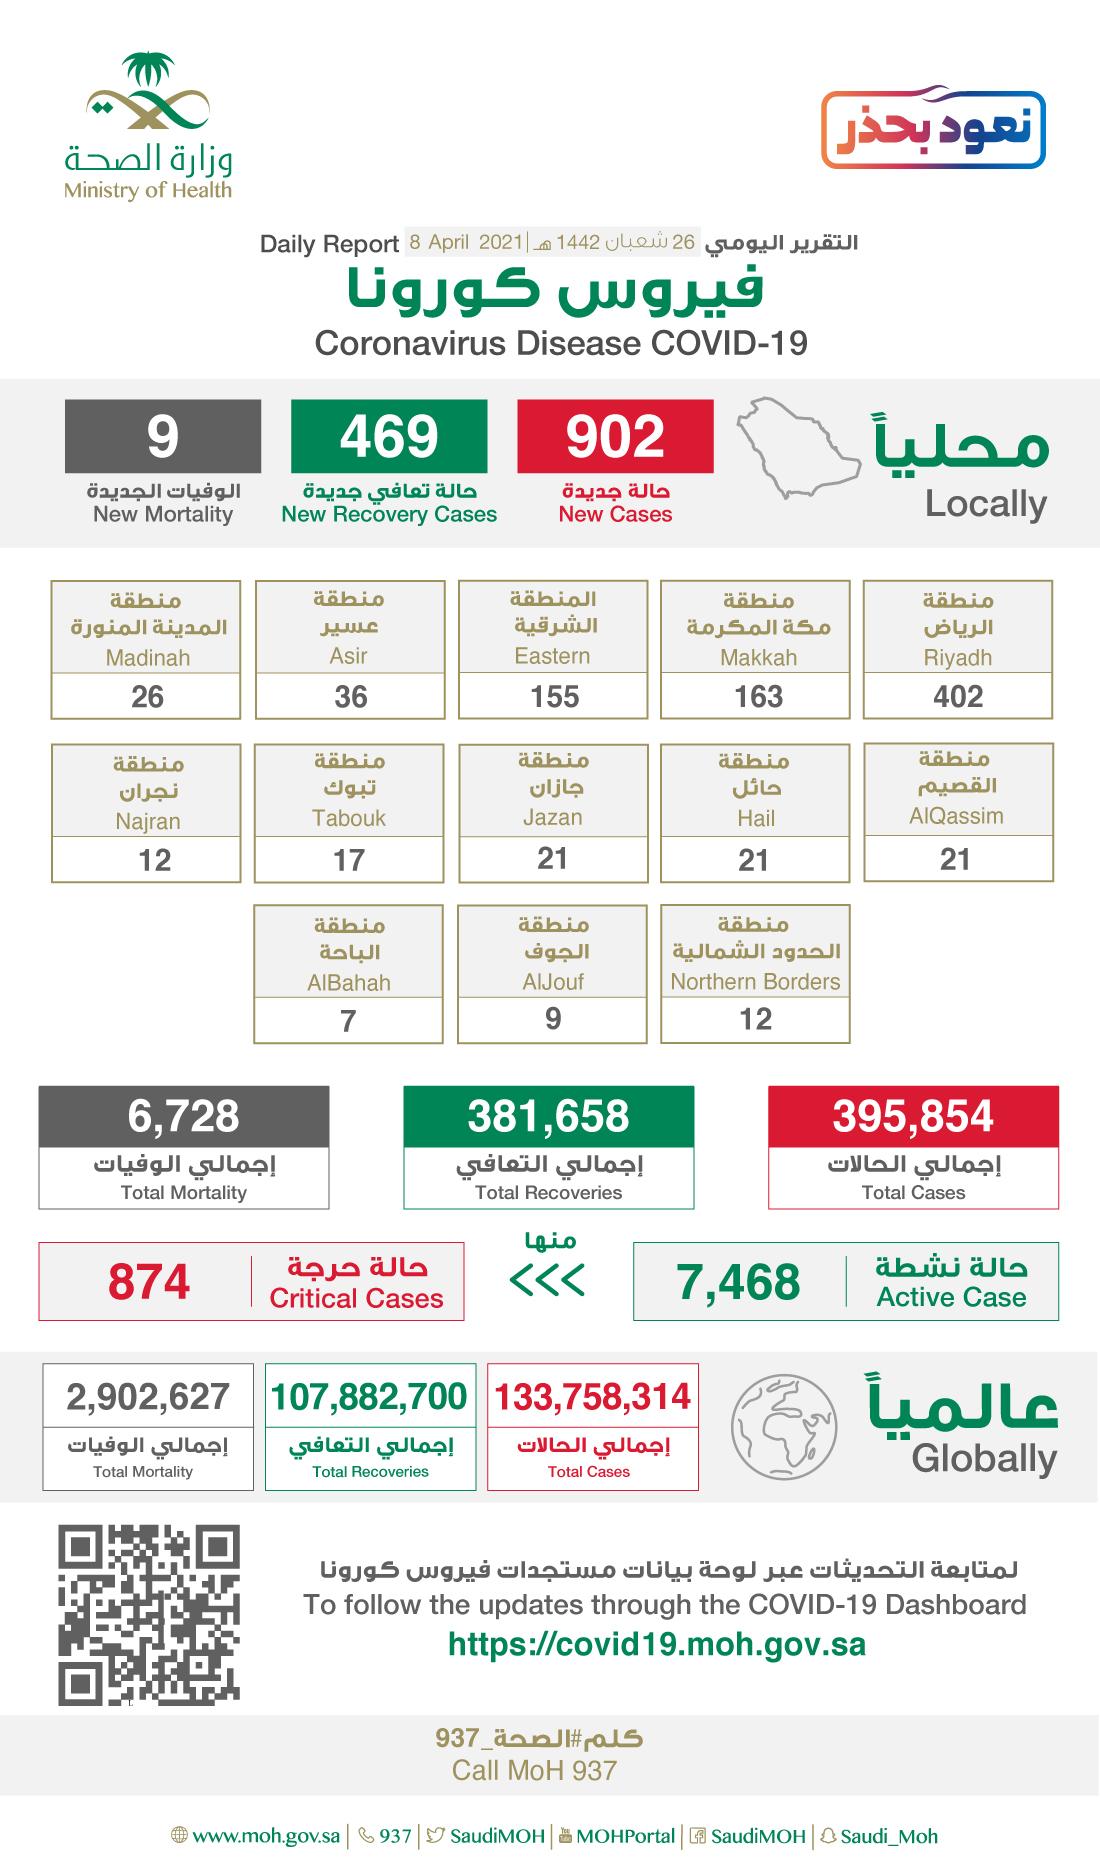 Saudi Arabia Coronavirus : Total Cases :395,854, New Cases : 902, Cured : 381,658, Deaths: 6,728, Active Cases : 7,468